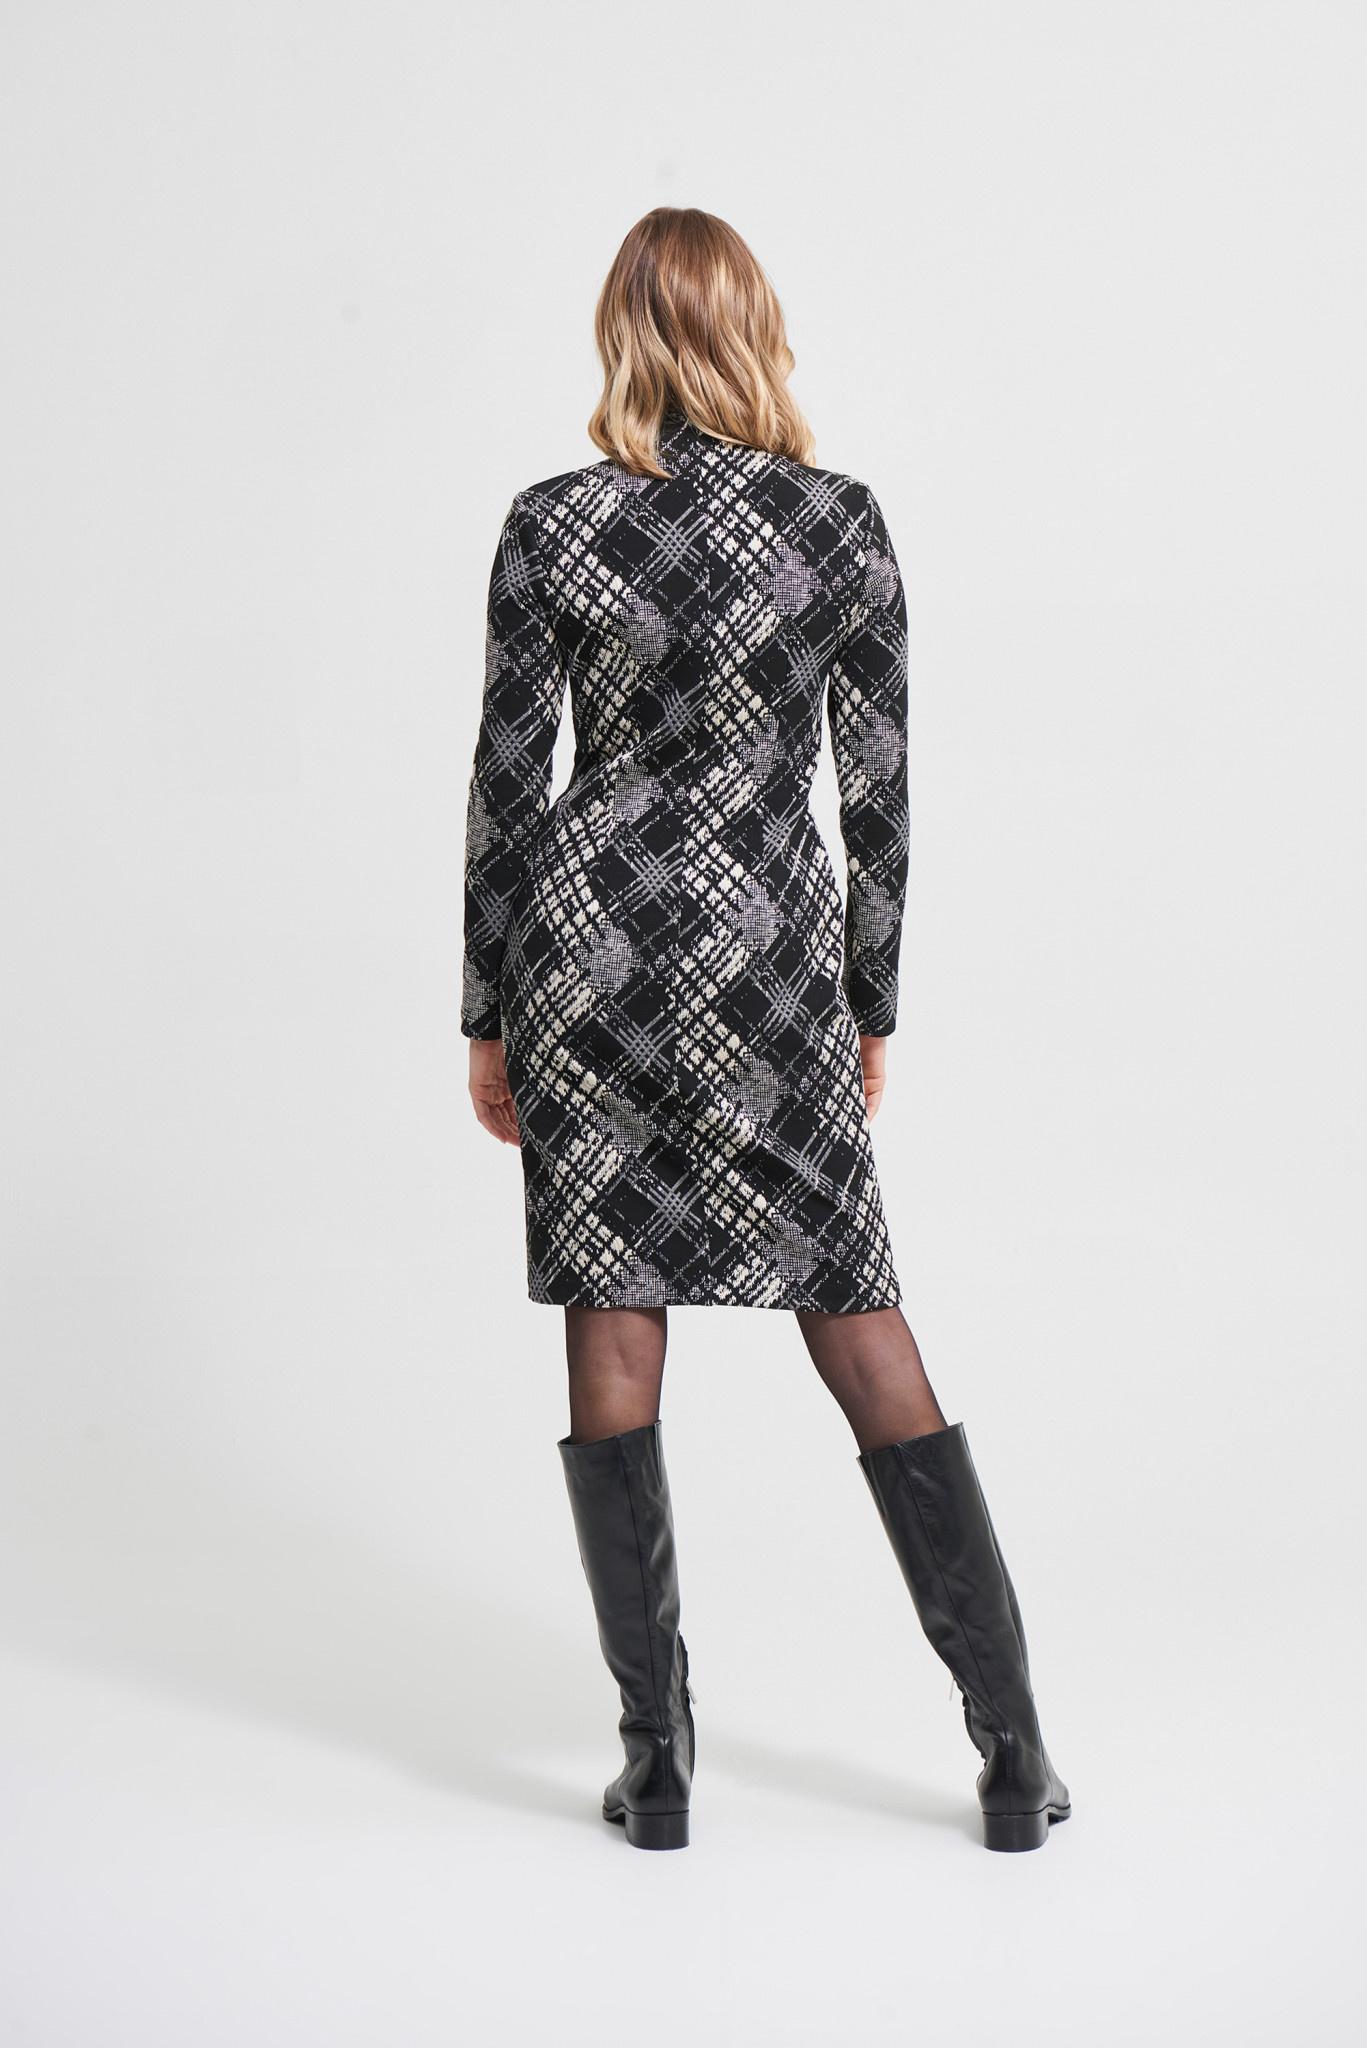 Houndstooth Check Dress